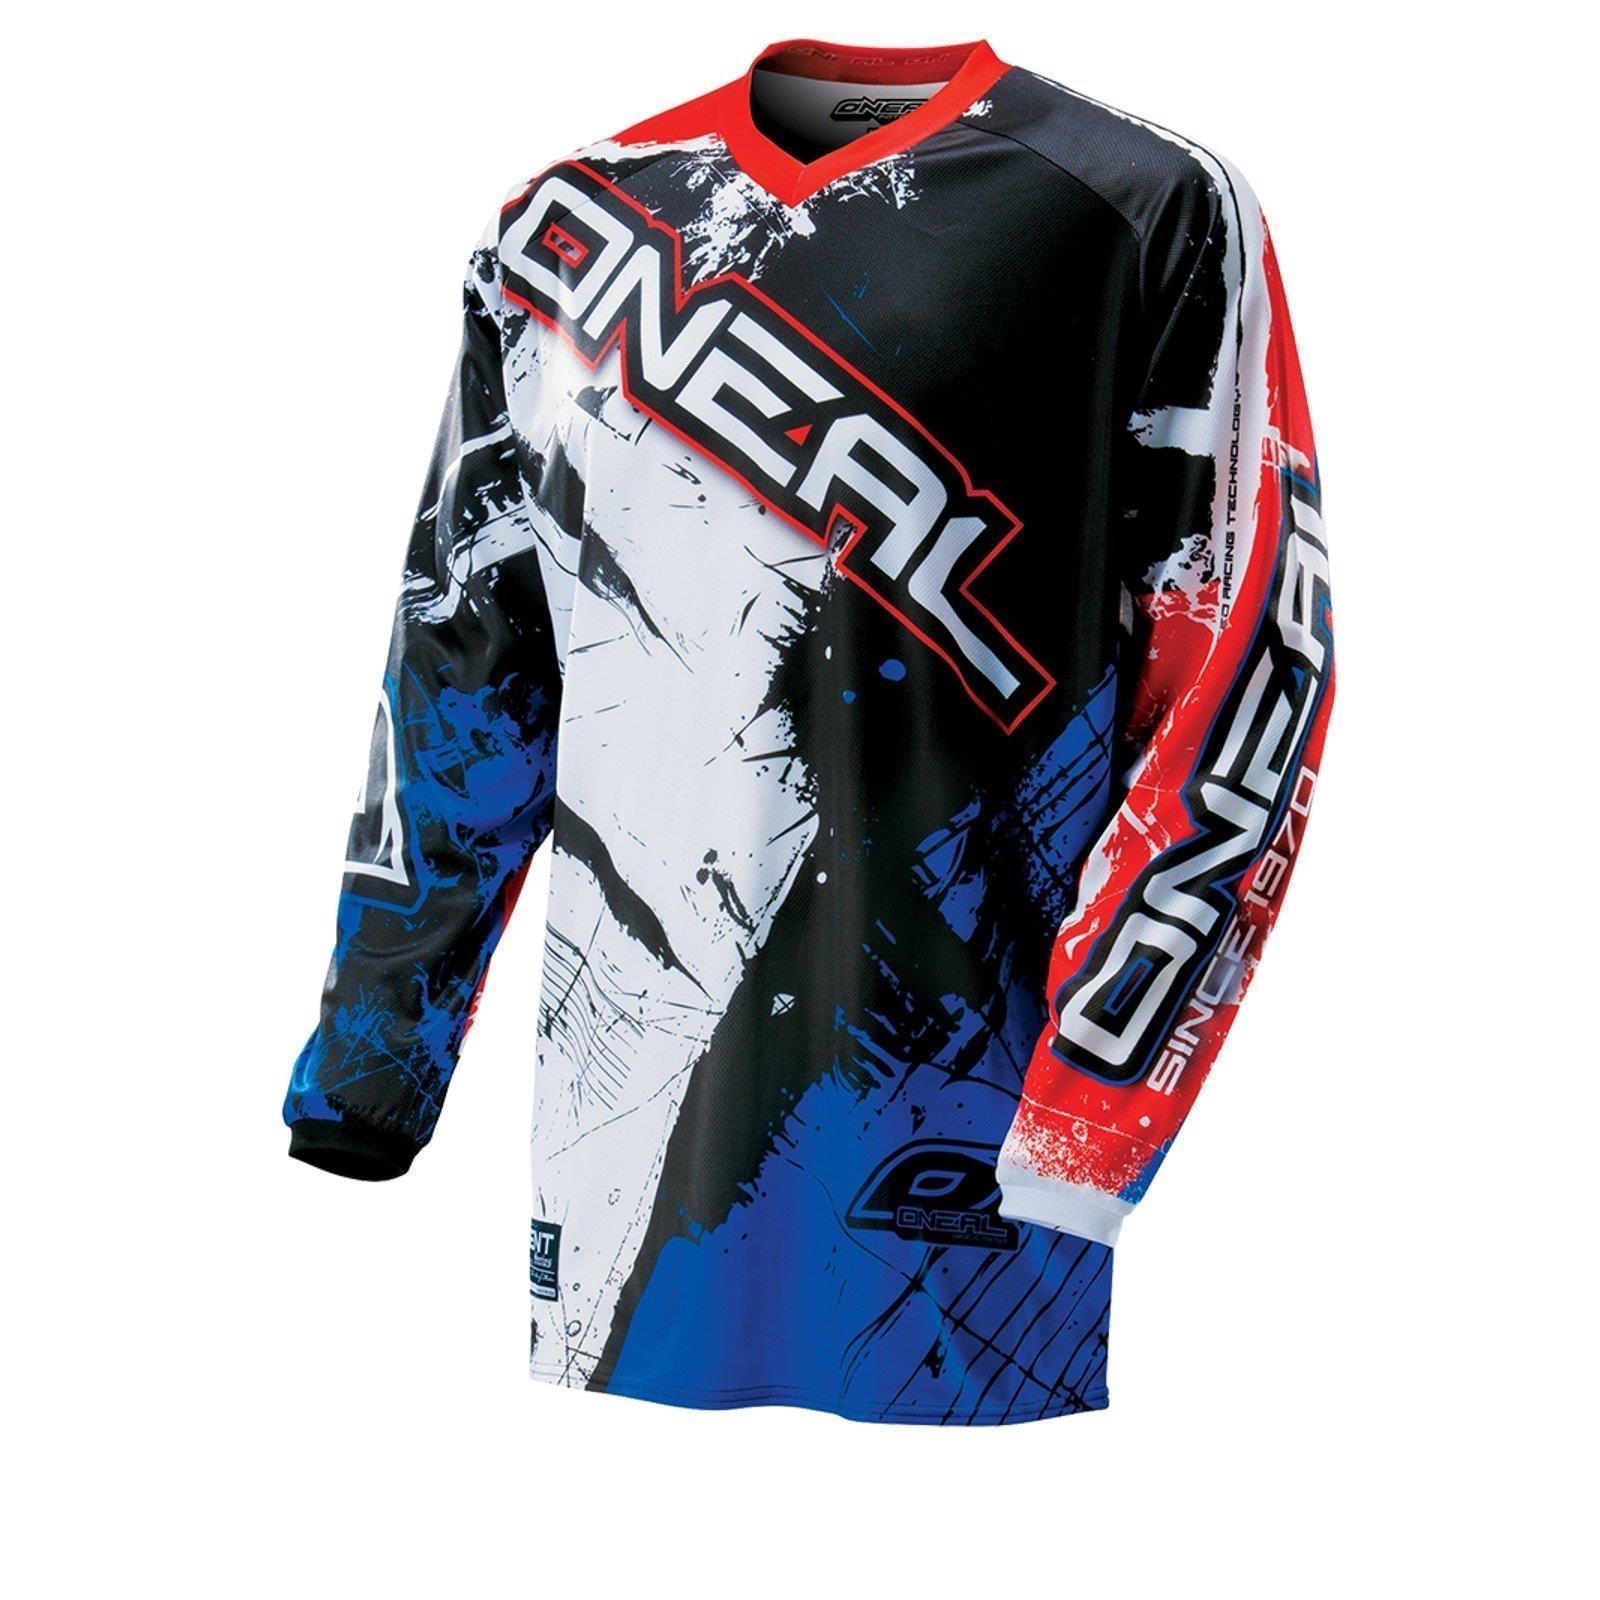 Oneal-elemento-ninos-MX-Jersey-pantalones-Shocker-Moto-Cross-Enduro-Mountainbike-MTB miniatura 11